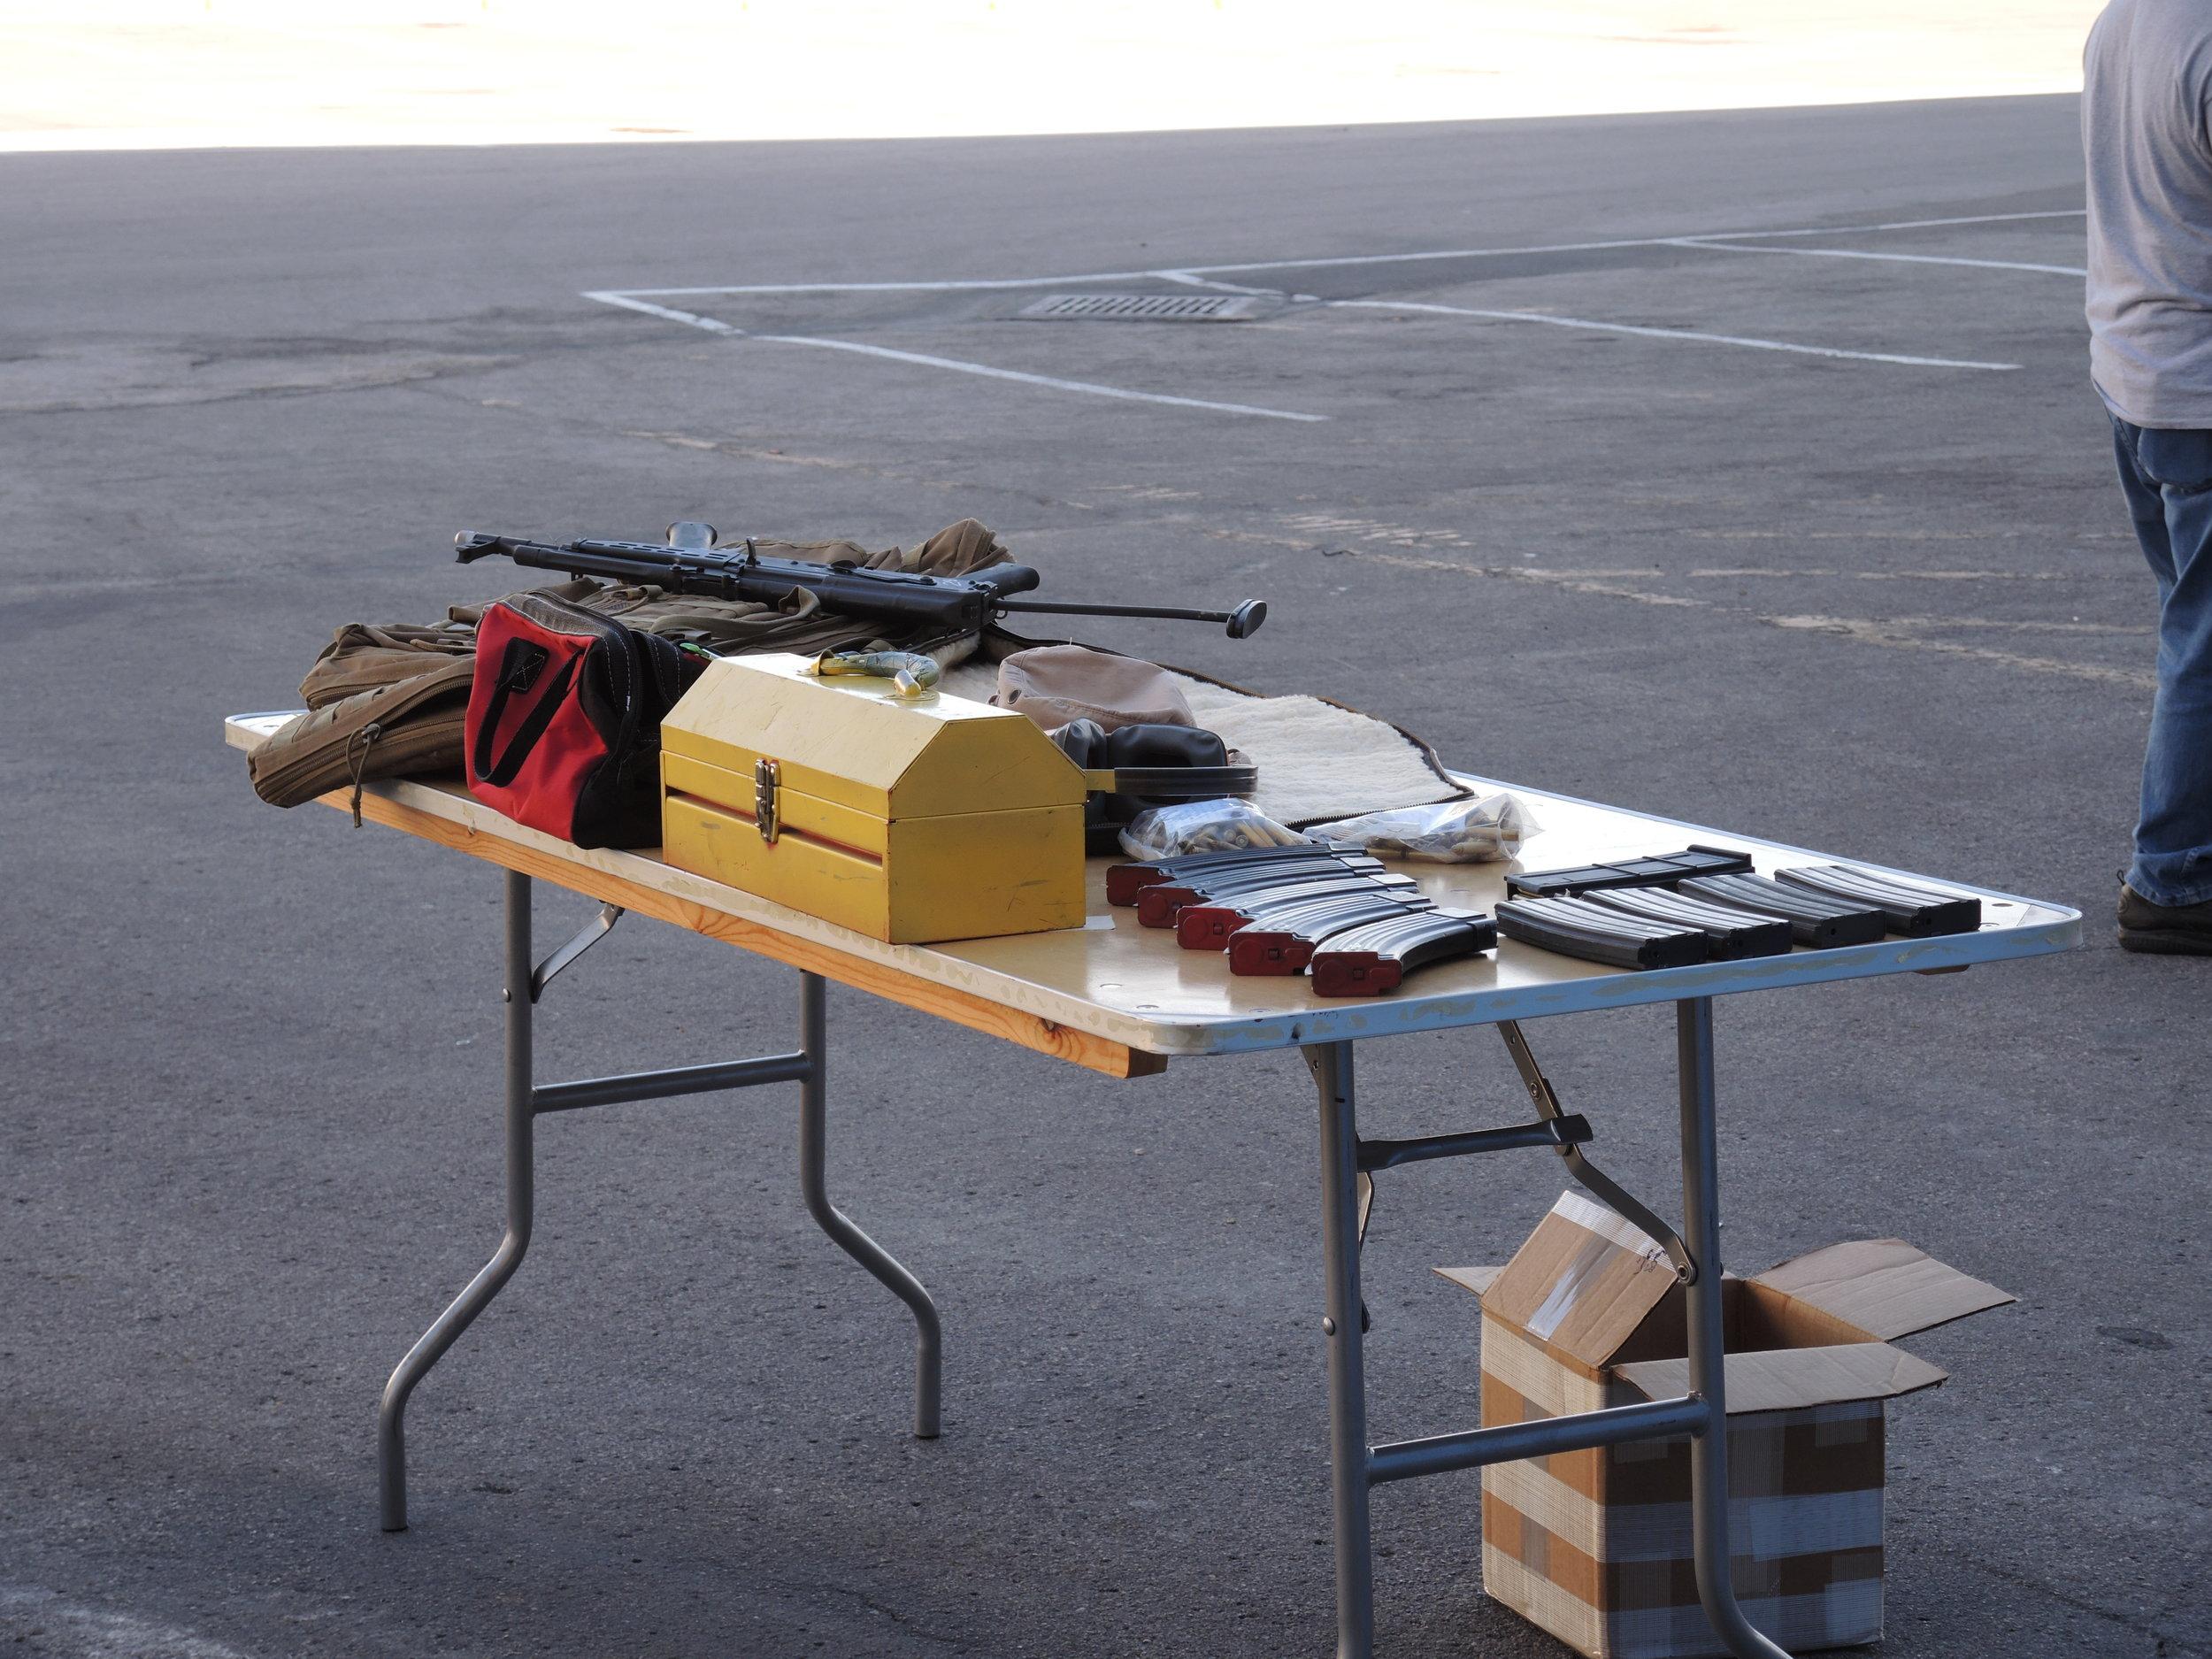 DSCN0160 AK.JPG